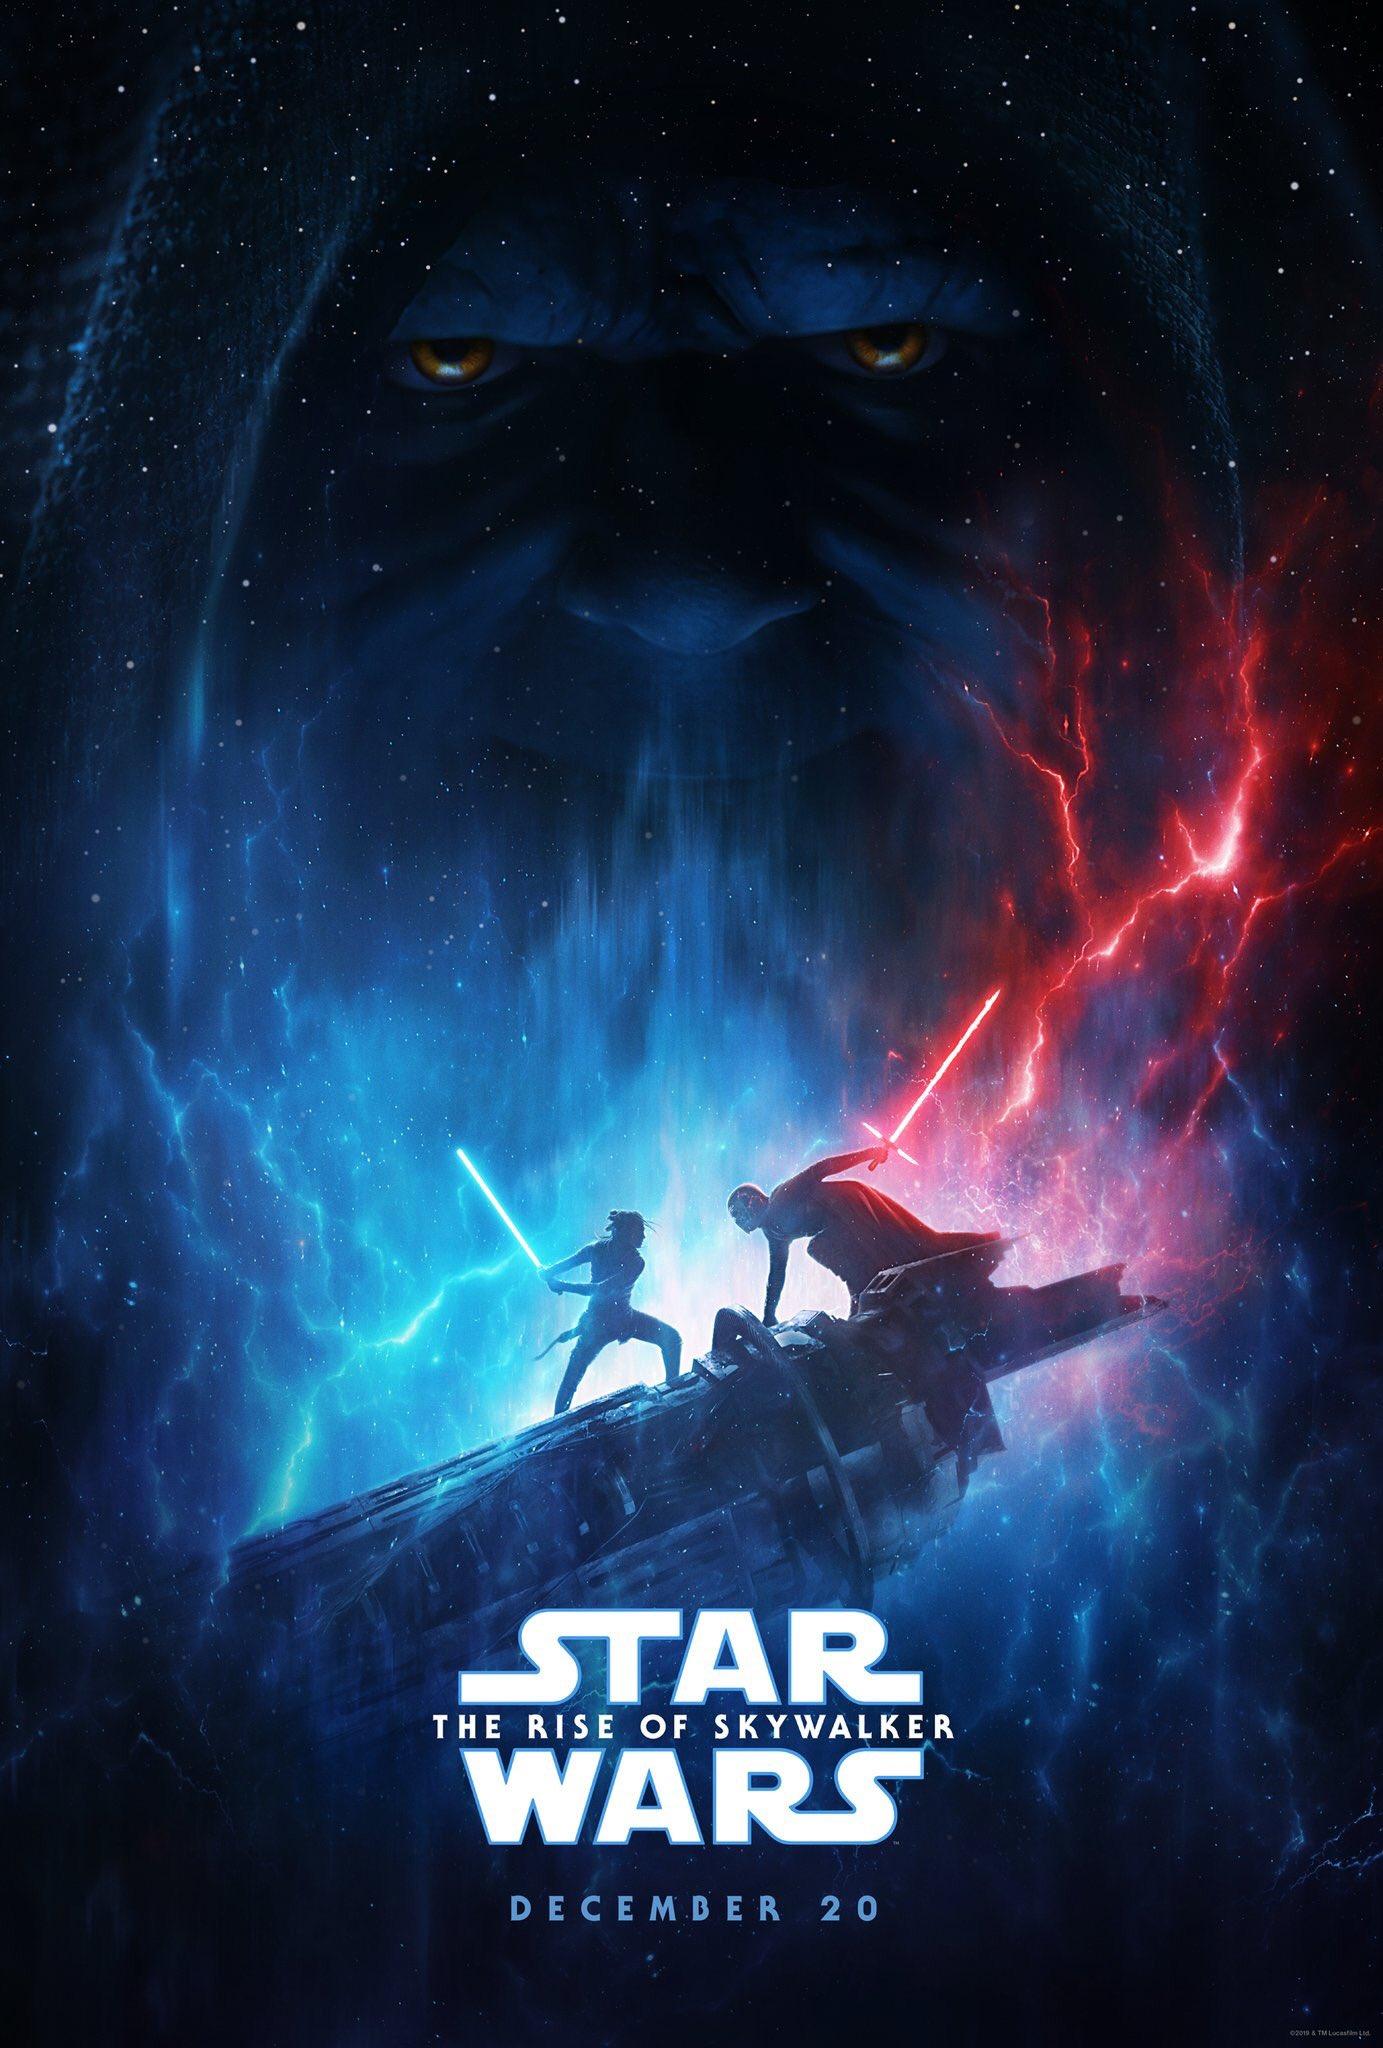 affiche du film Star Wars : Épisode IX - L'ascension de Skywalker